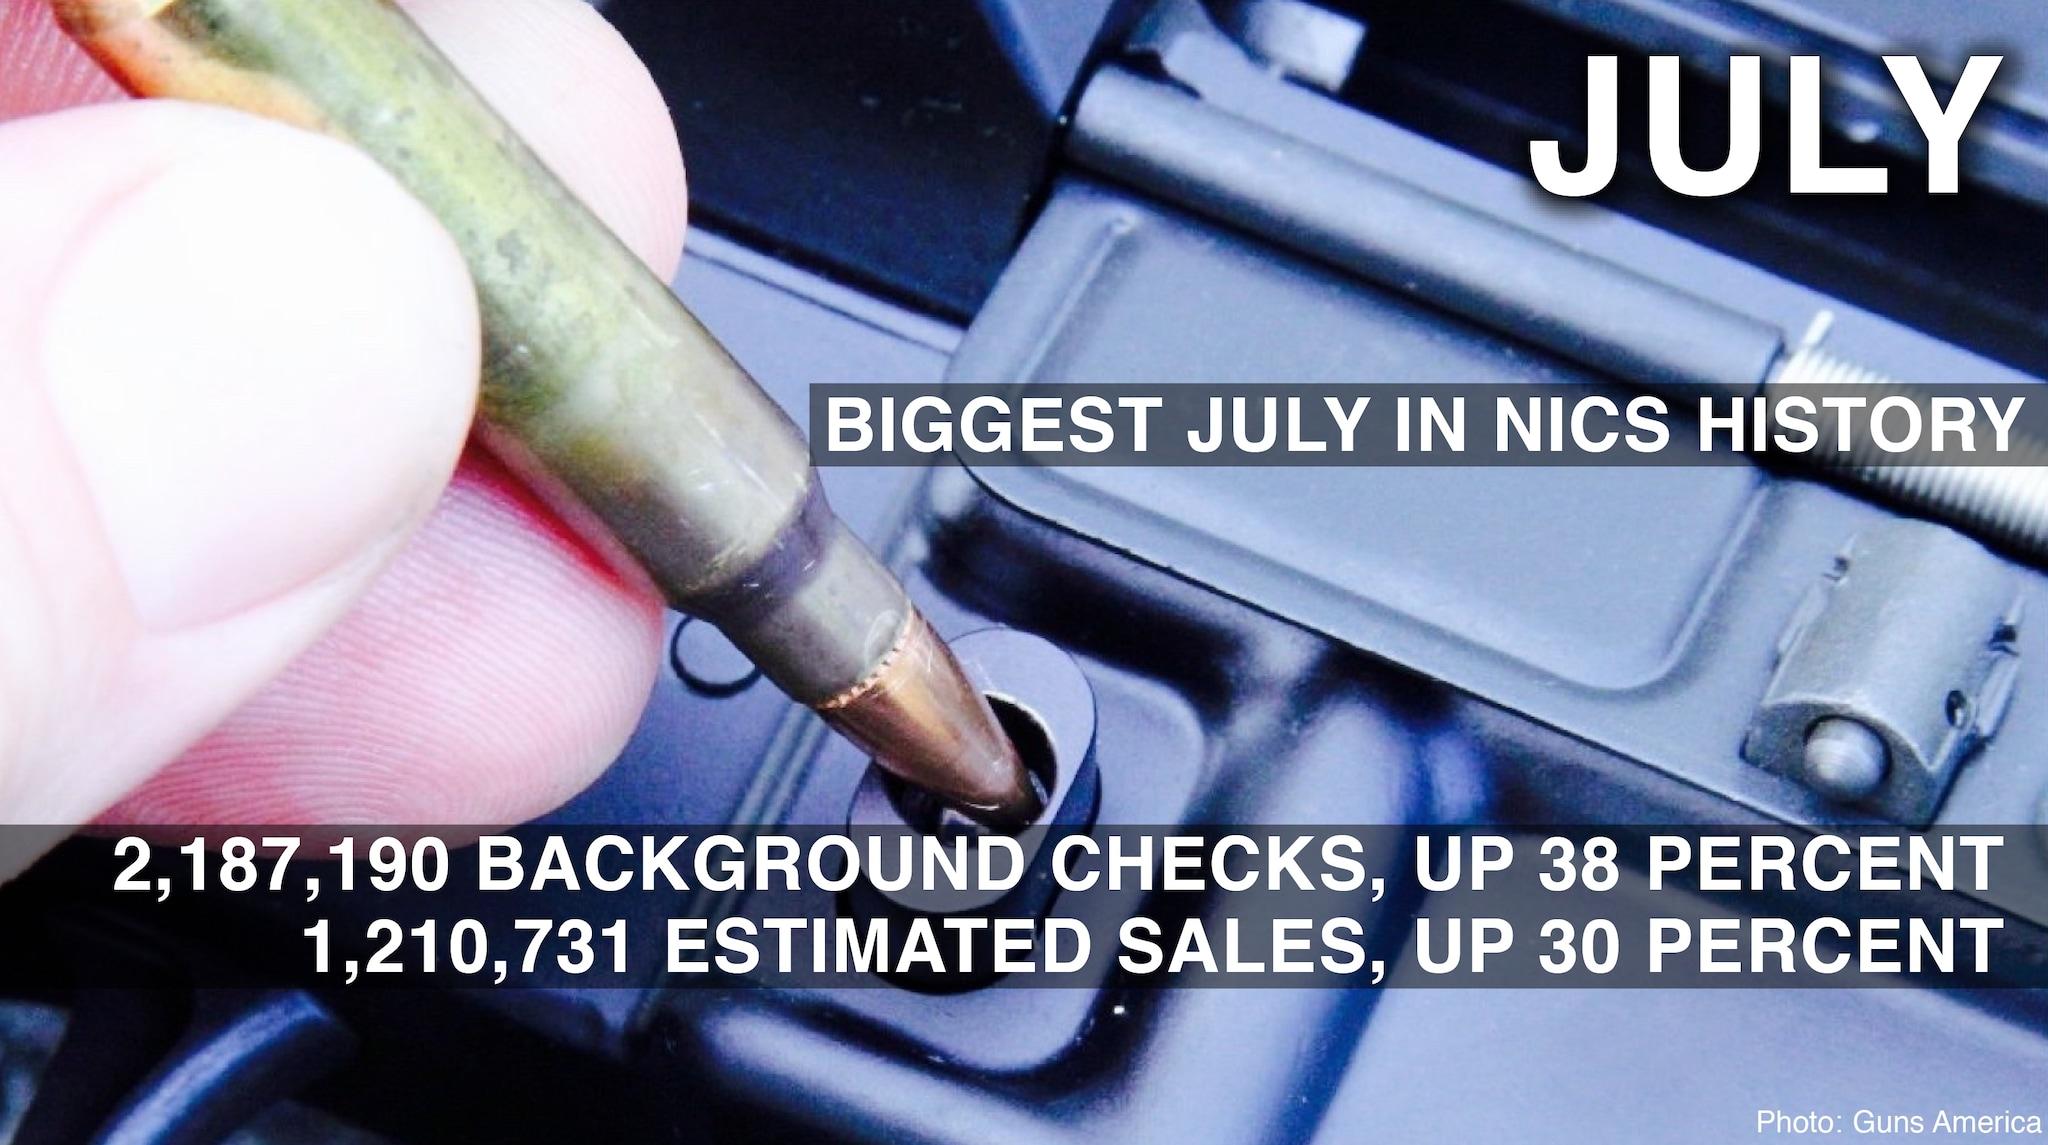 july 2016 background check stats